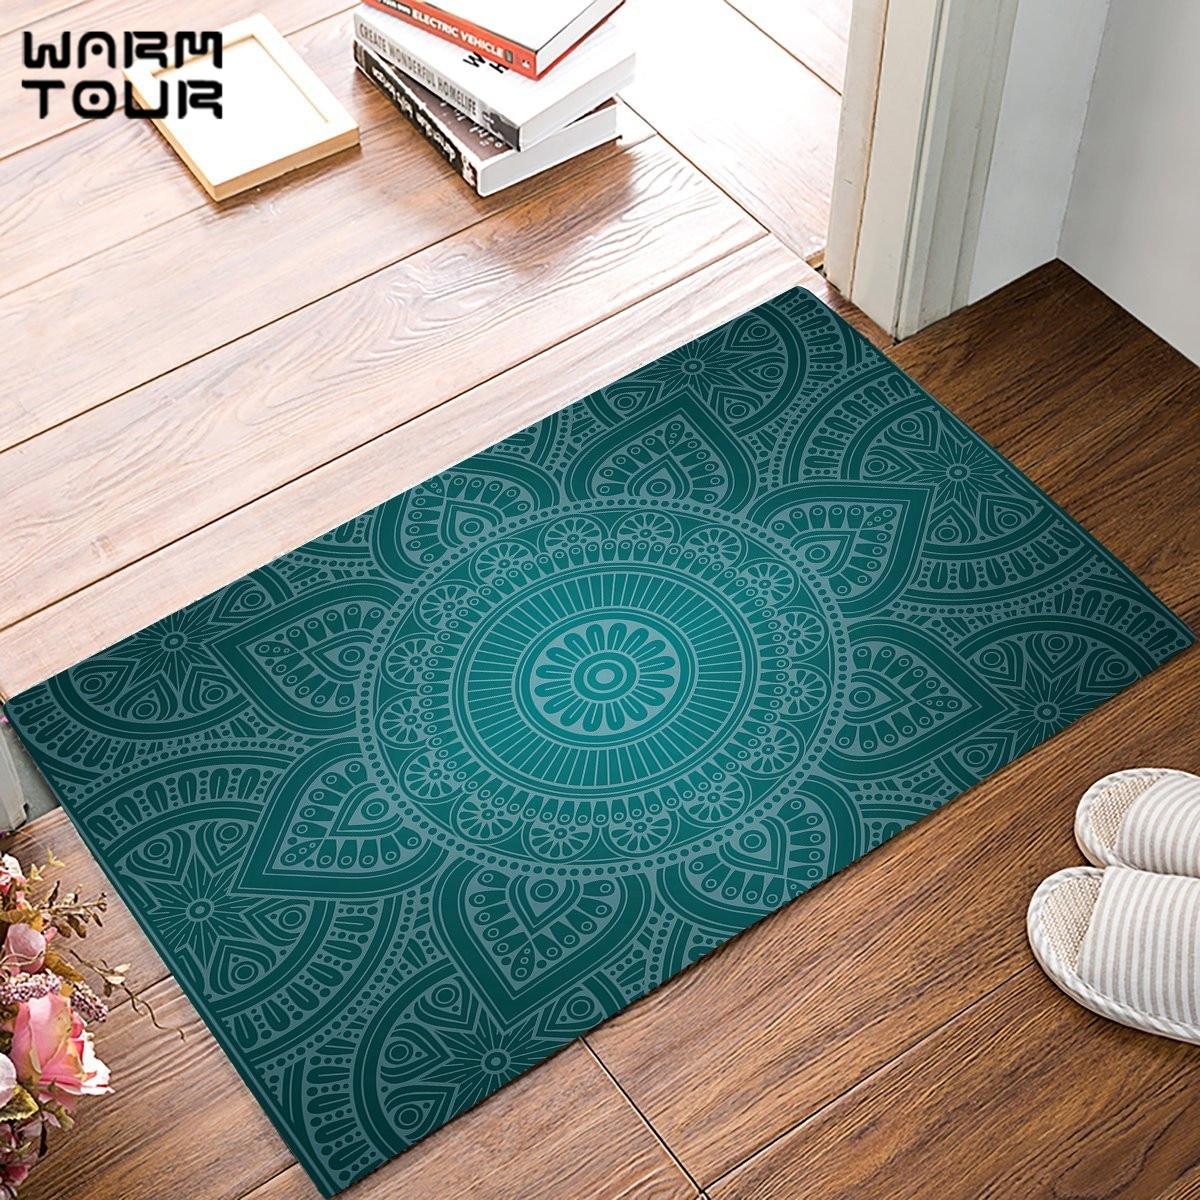 Vintage Mandala Decorative Pattern Door Mats Kitchen Floor